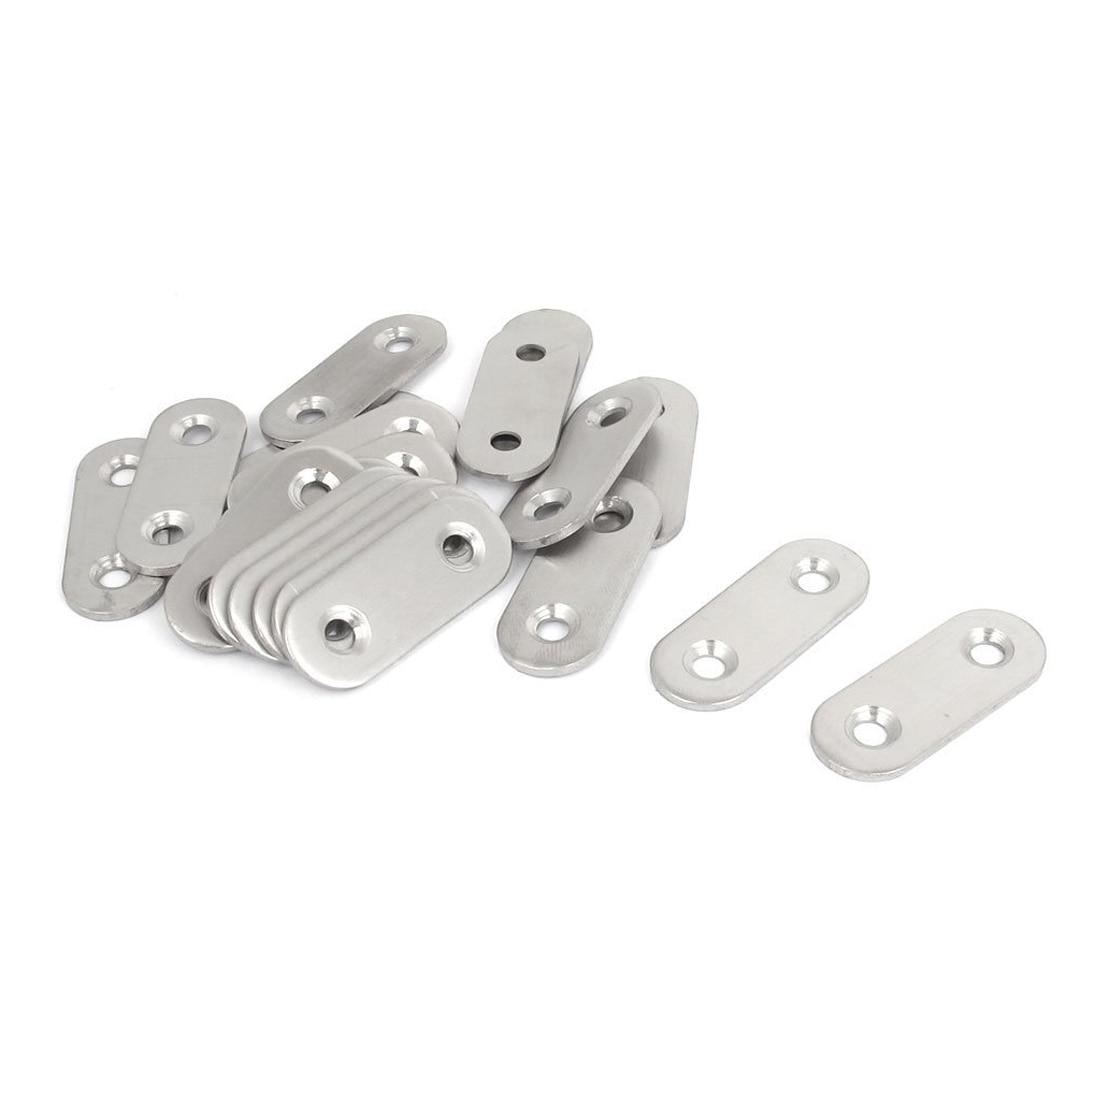 Stainless Steel Flat Bracket Straight Mending Fixing Plates 40mm 20pcs